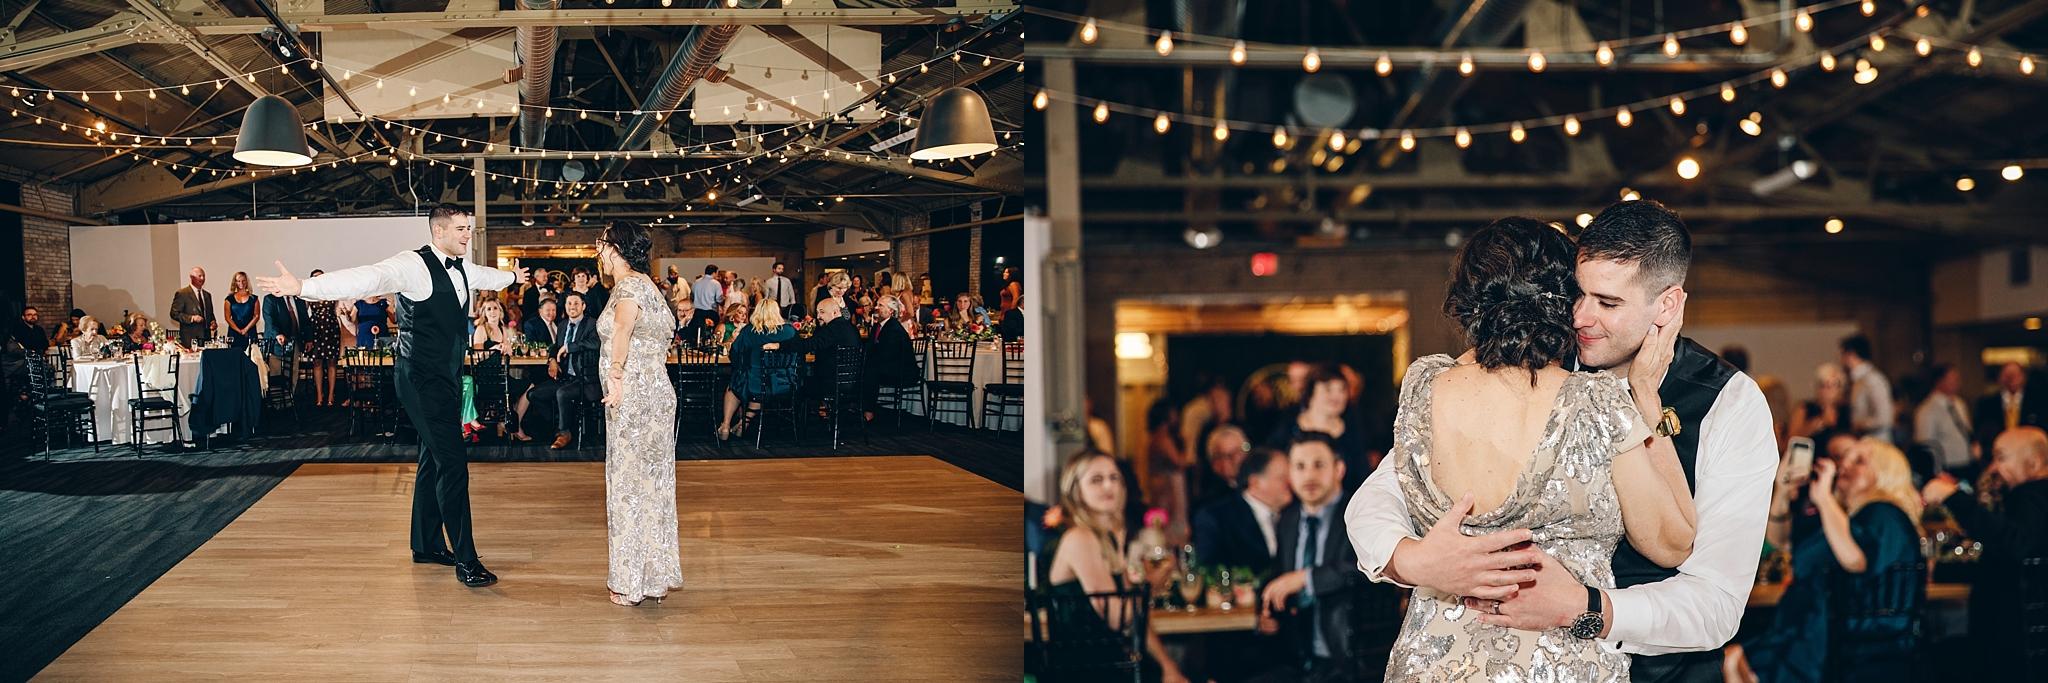 baker-lofts-holland-michigan-wedding-photographer_0396.jpg